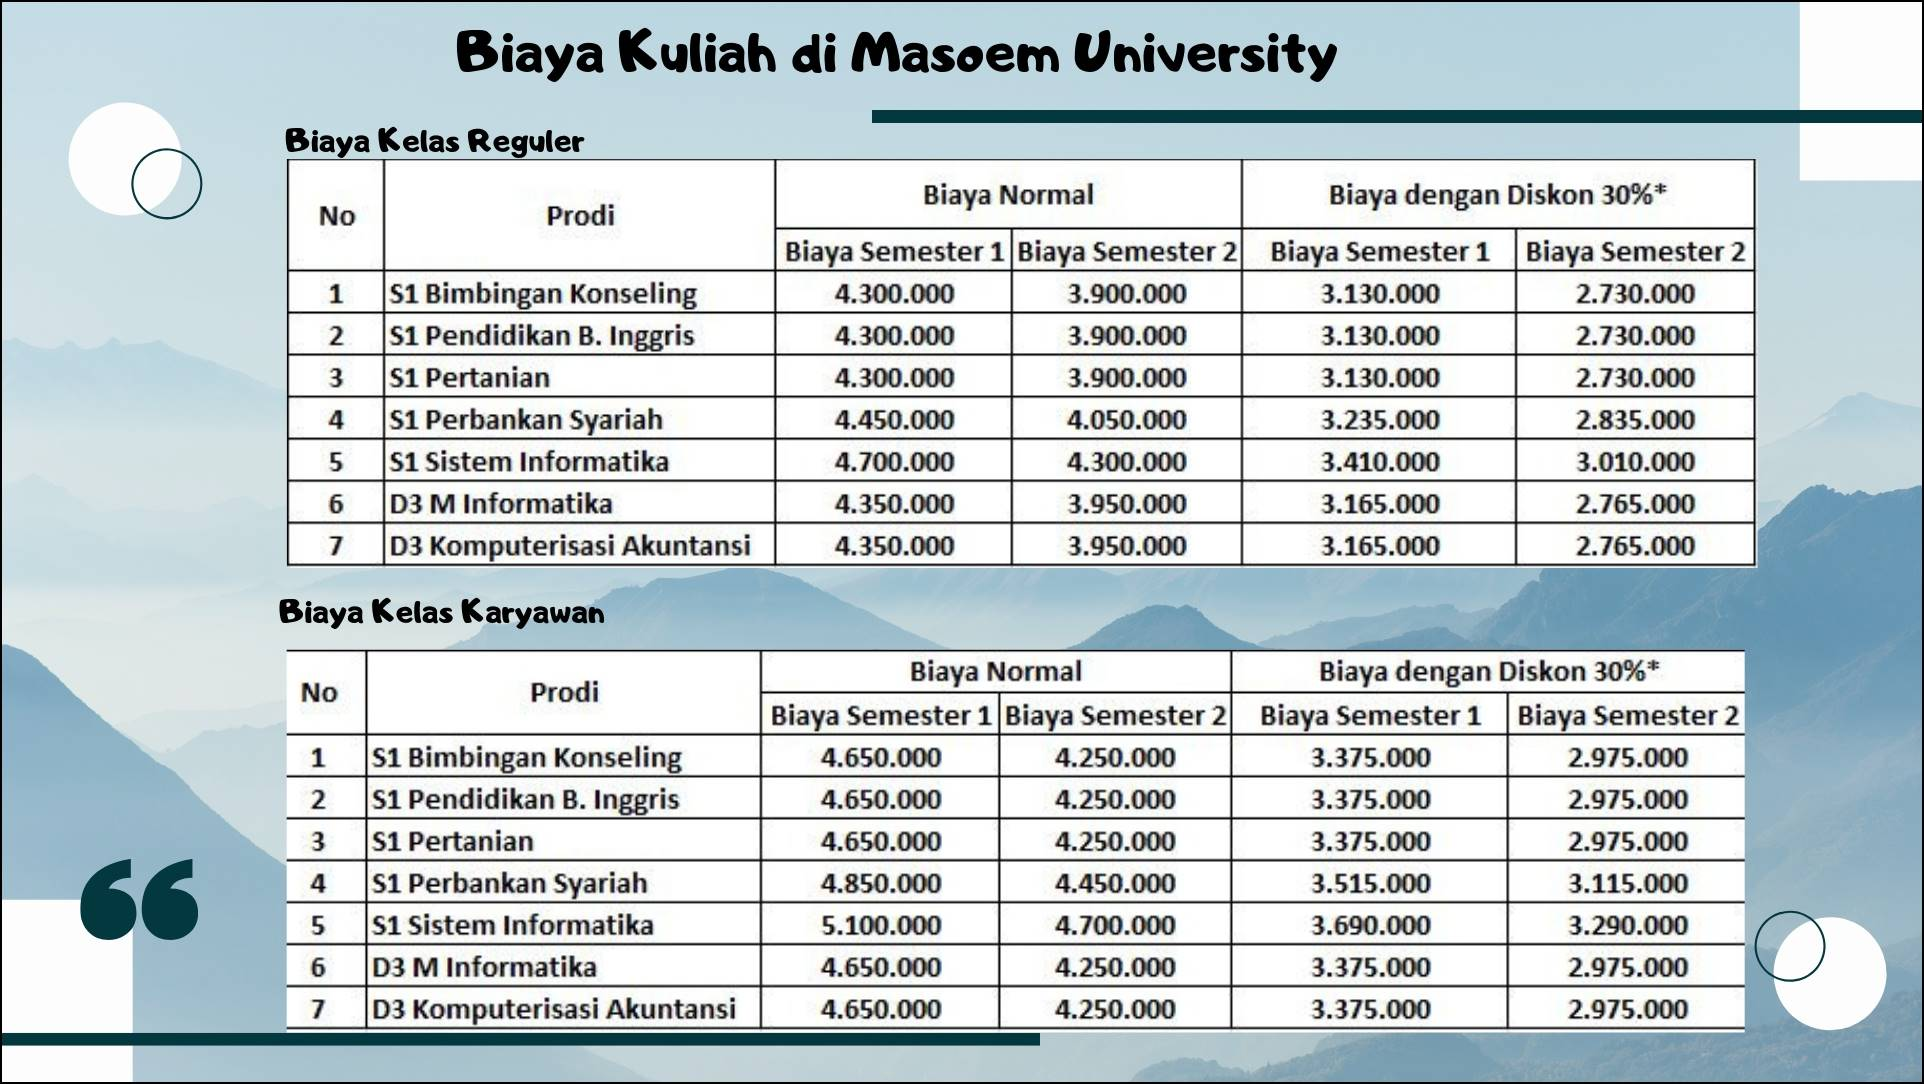 Biaya Kuliah di Masoem University